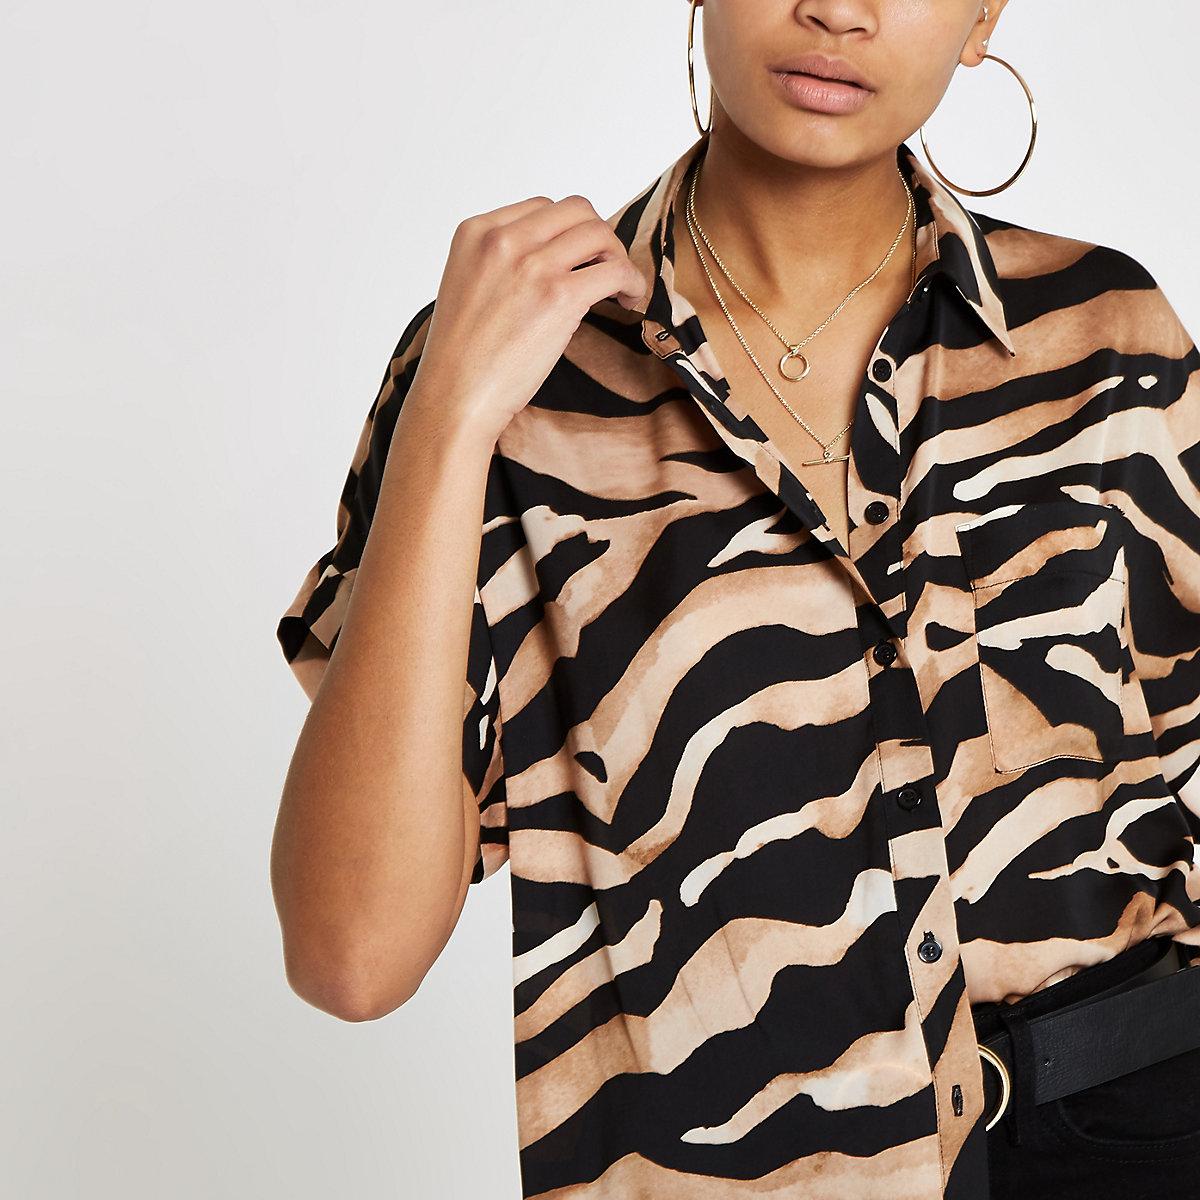 Brown tiger print short sleeve shirt